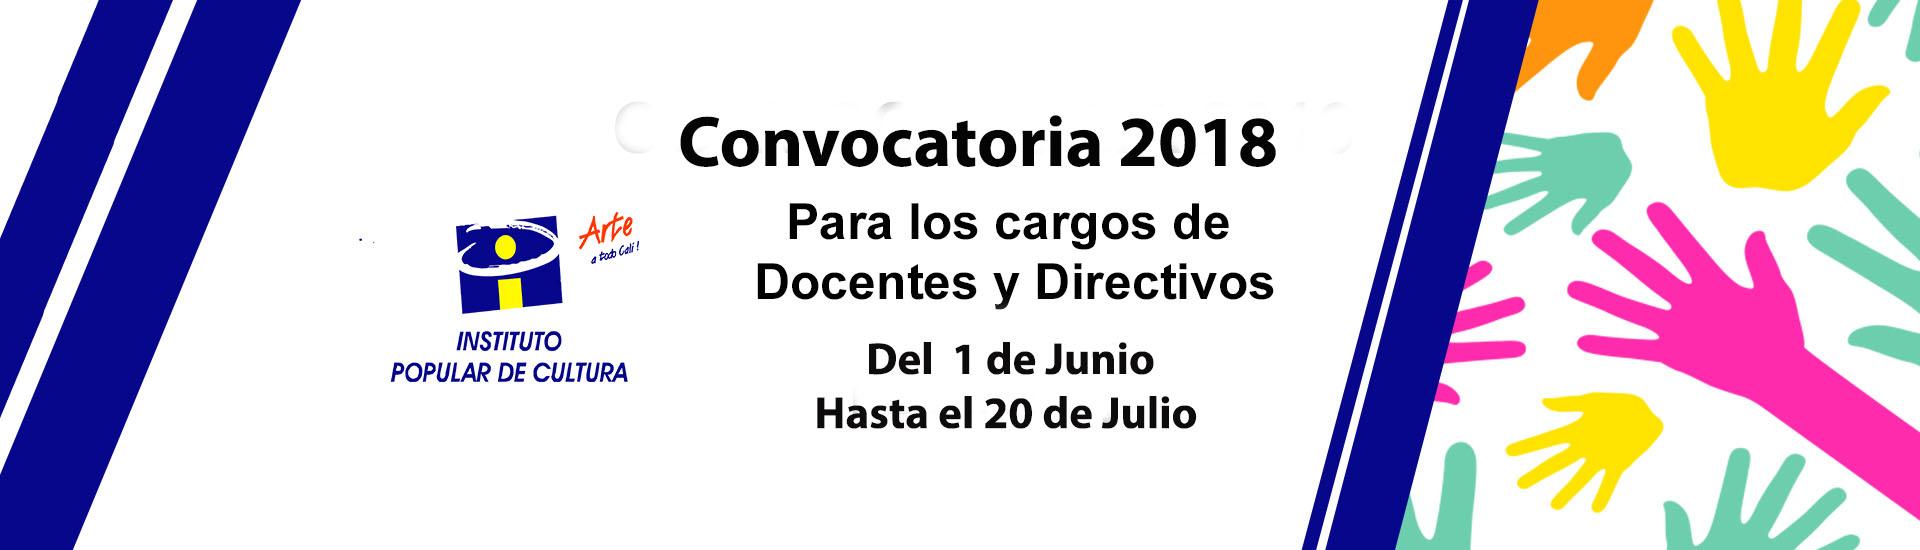 convocatoria2018B